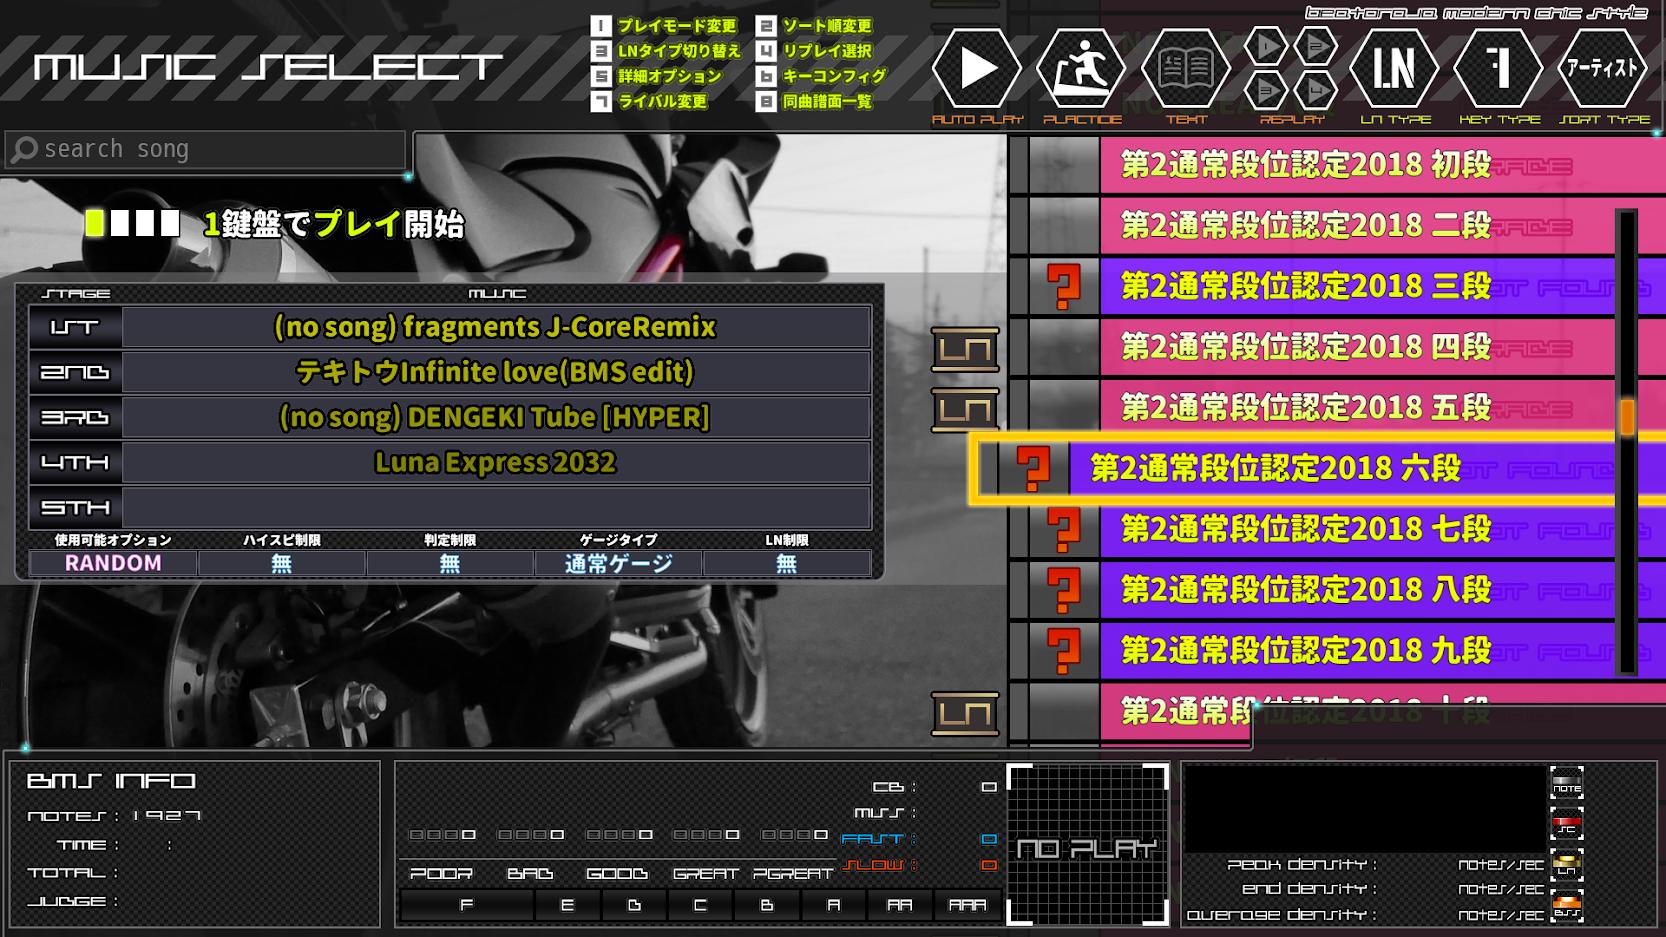 【beatoraja】選曲スキン・ModernChic1.1に更新しました